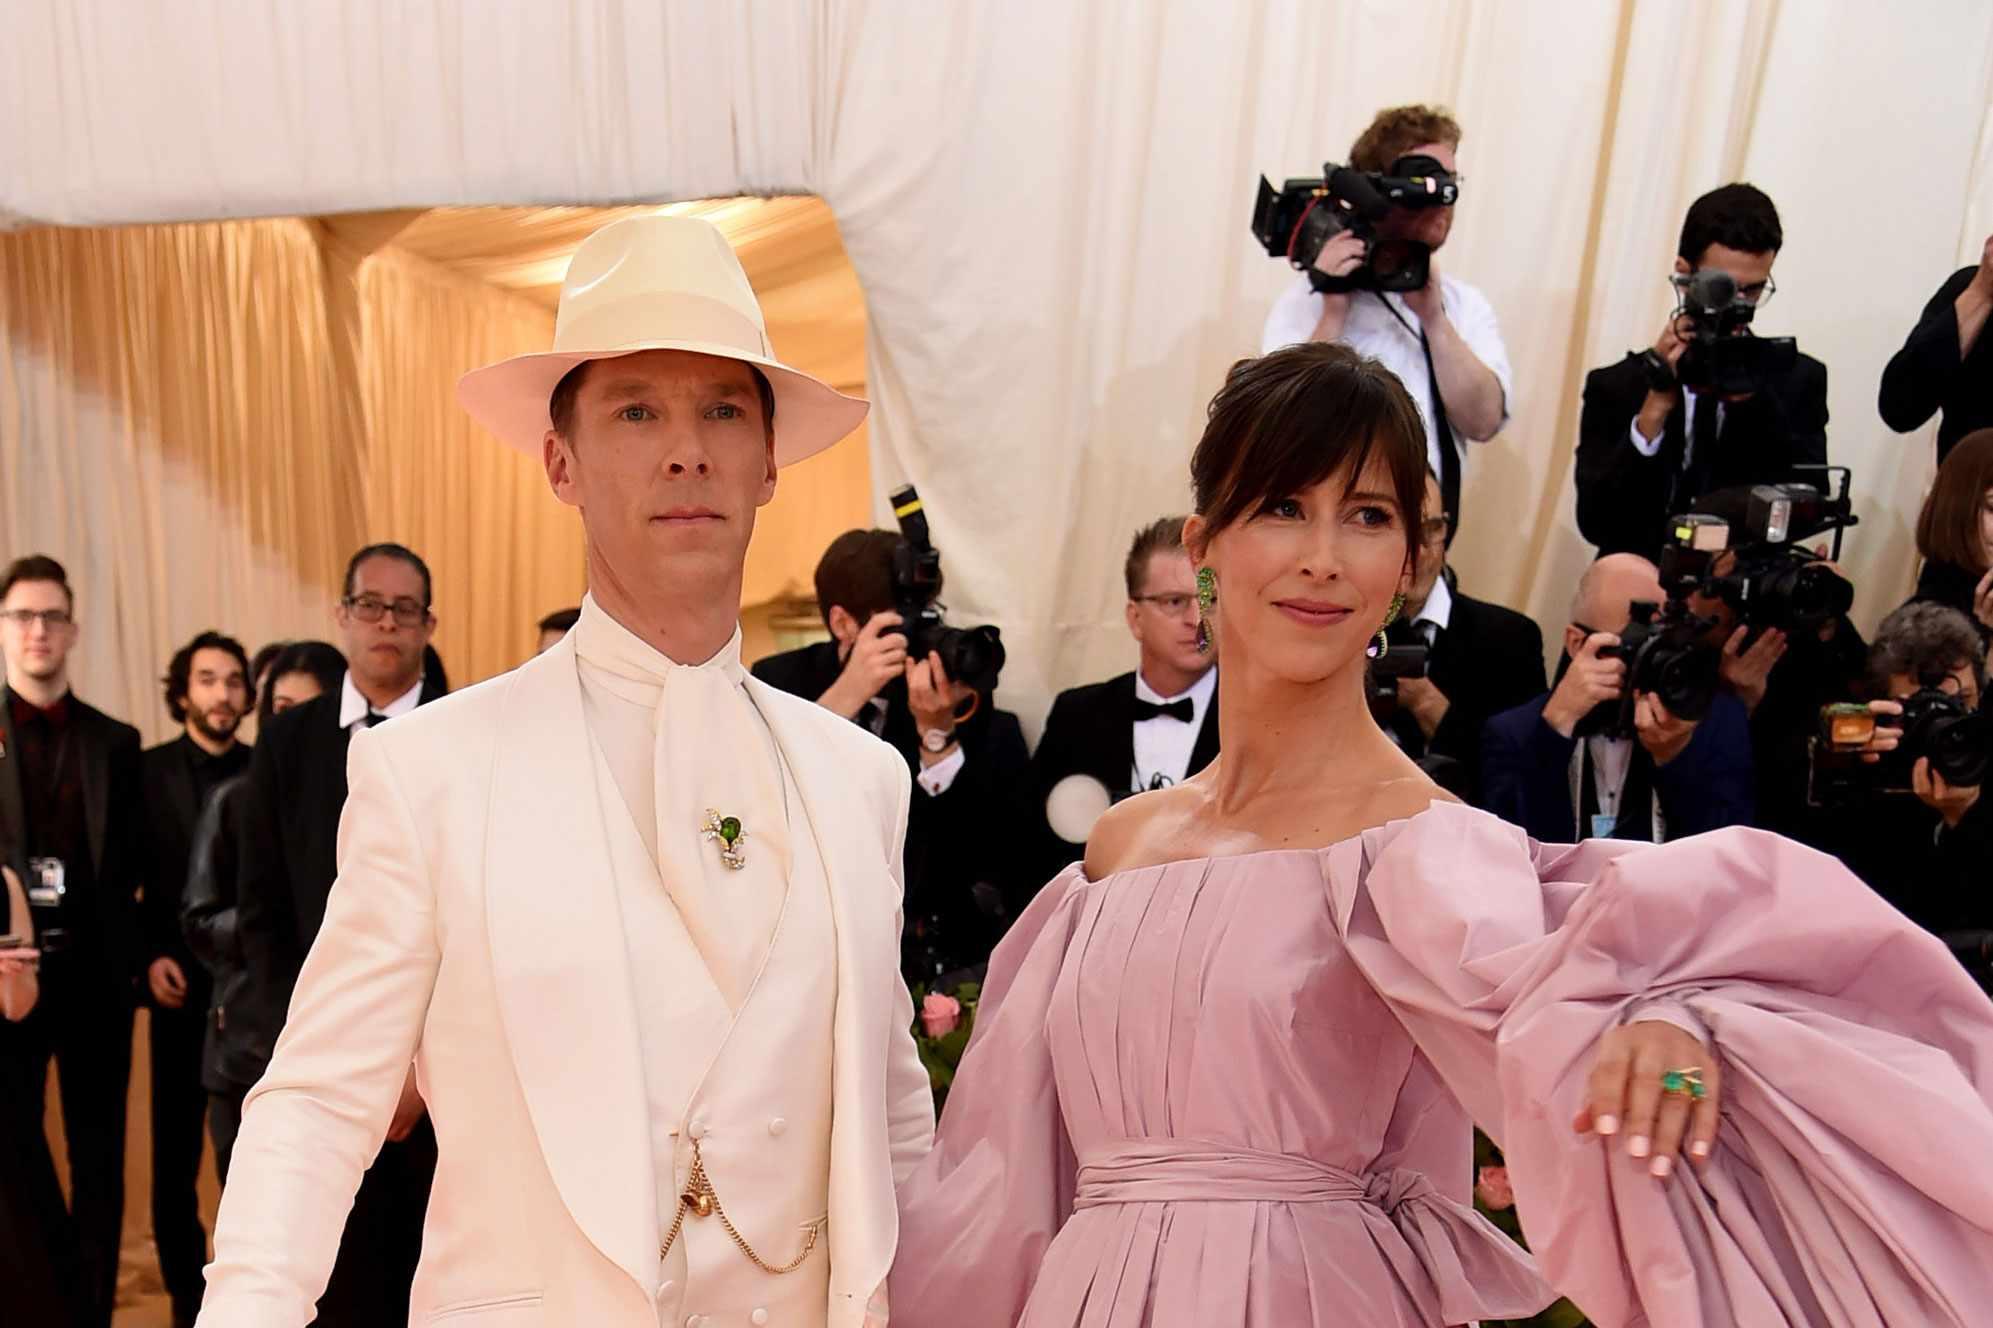 Benedict Cumberbatch, Met Gala 2019 (Getty Images)